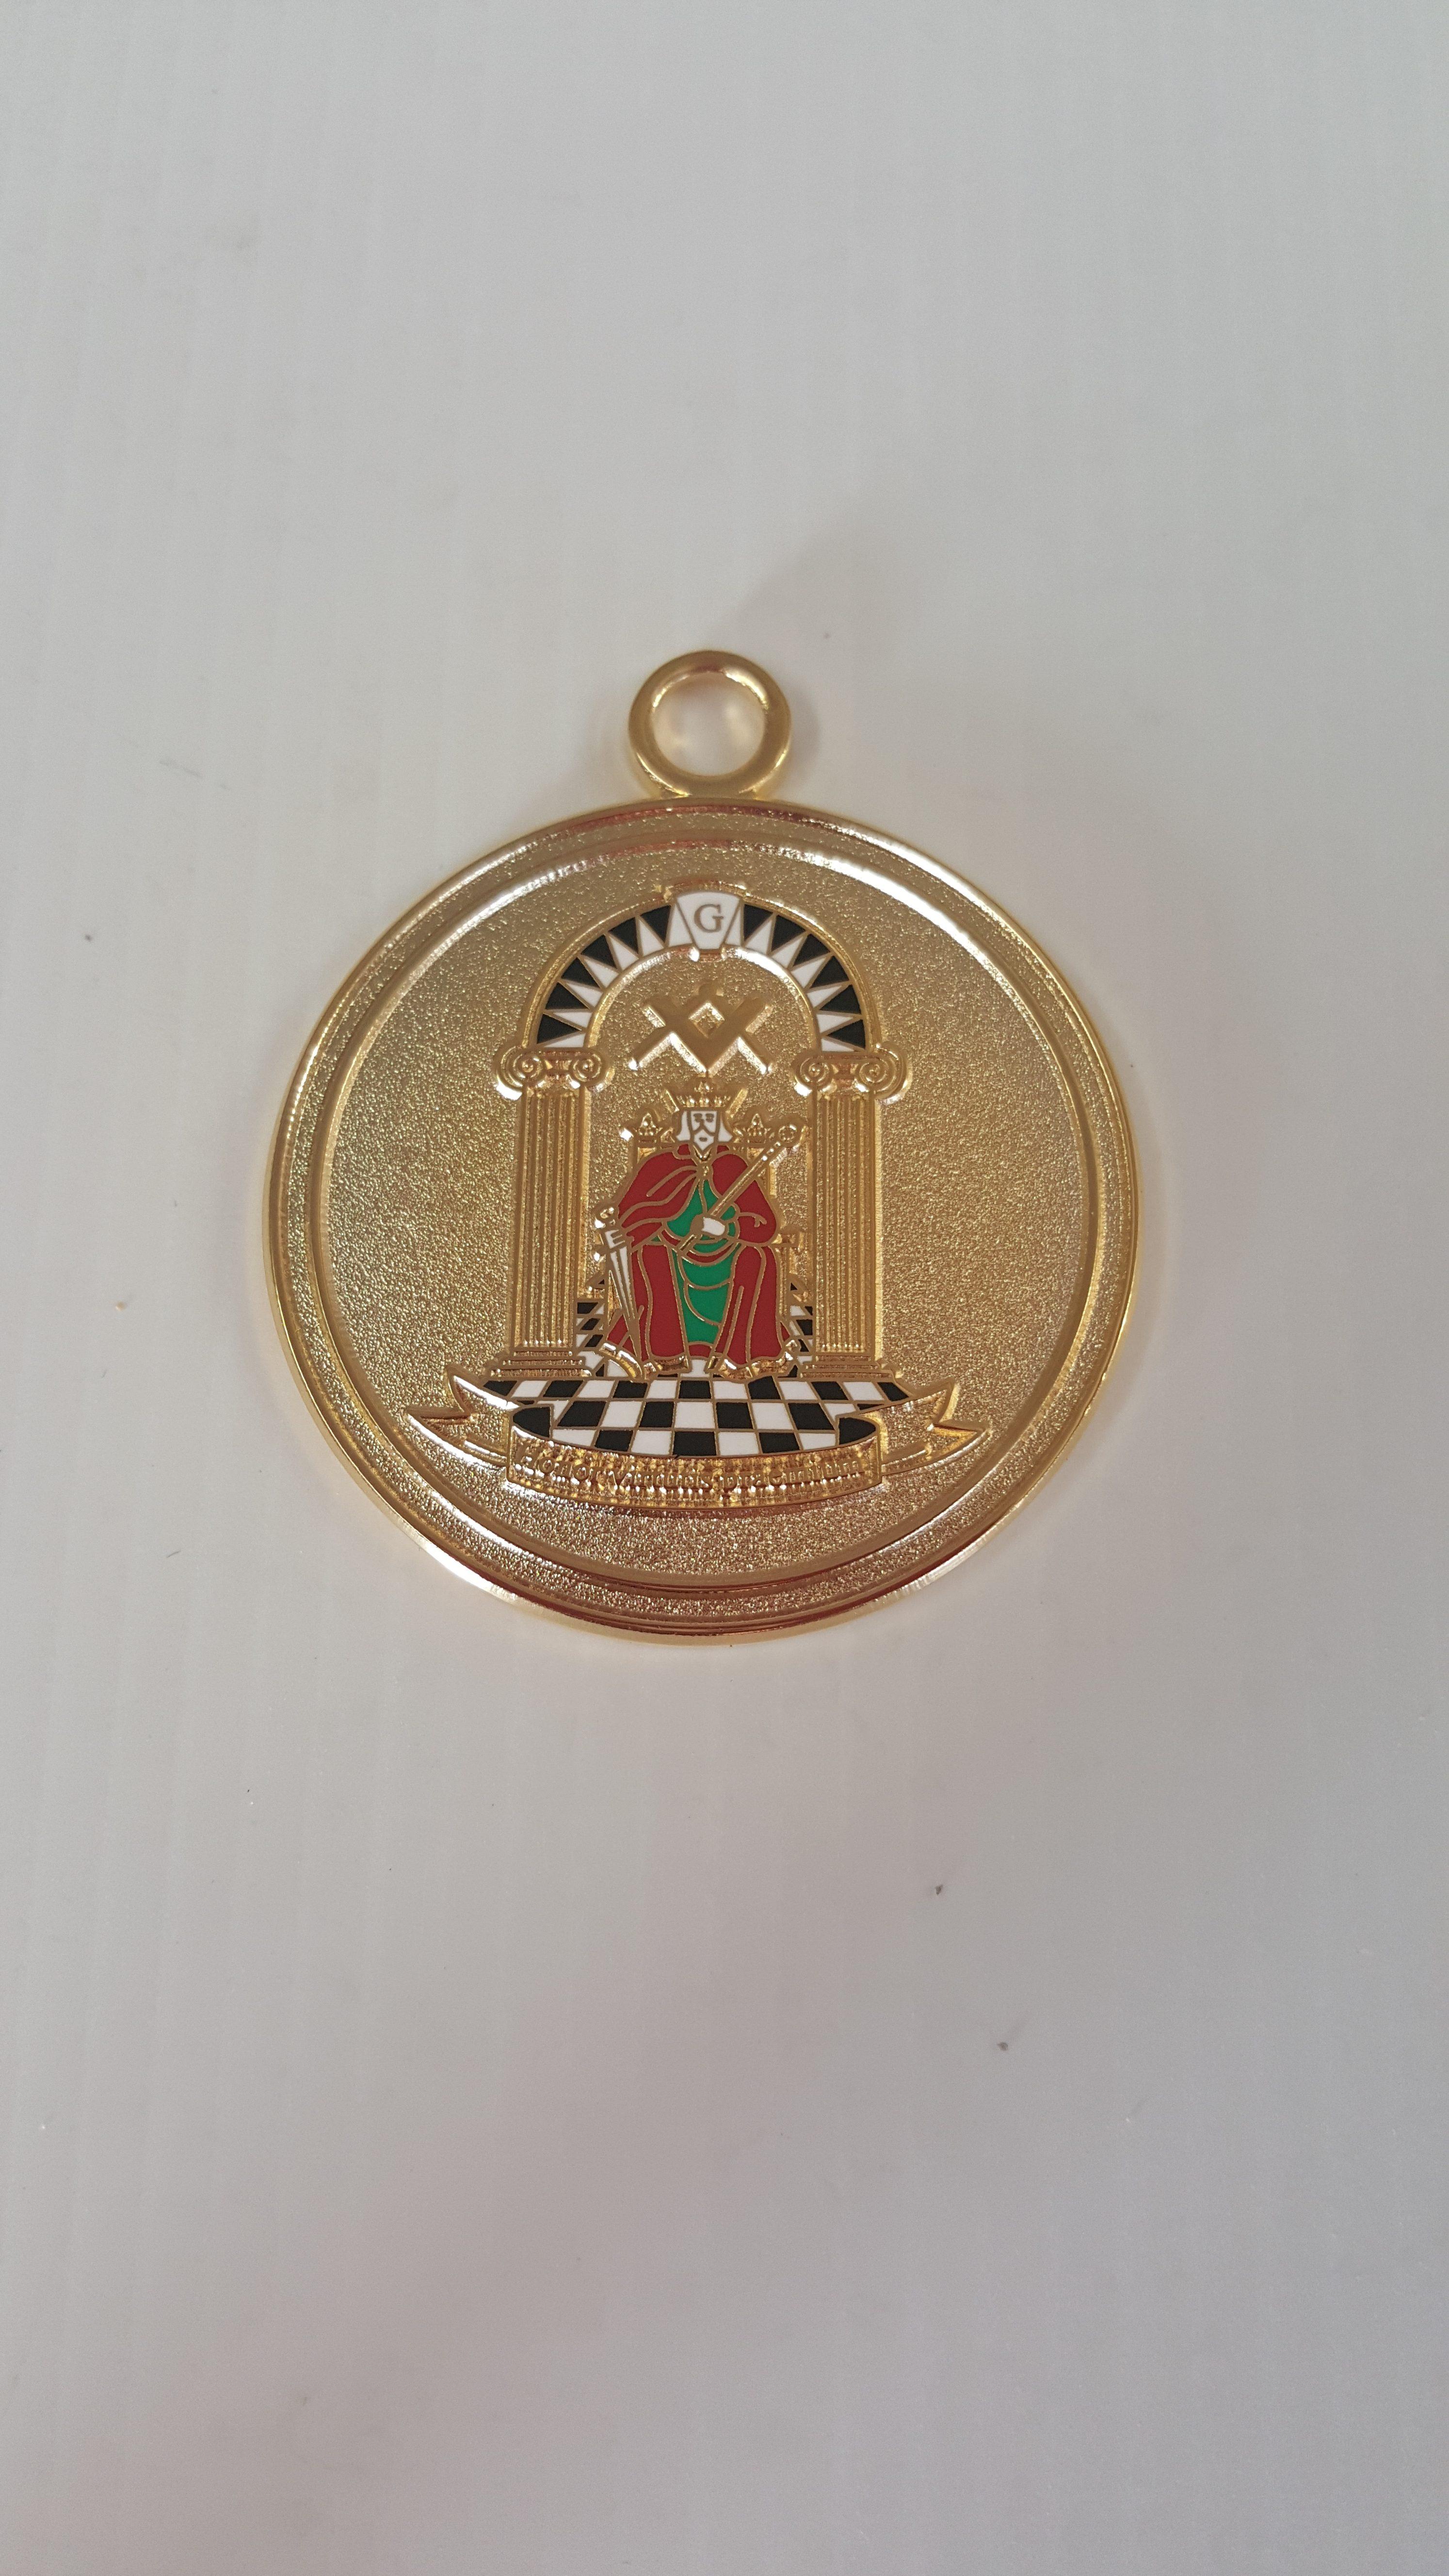 Masonic Order of Athelstan Past Provincial Collar Jewel new